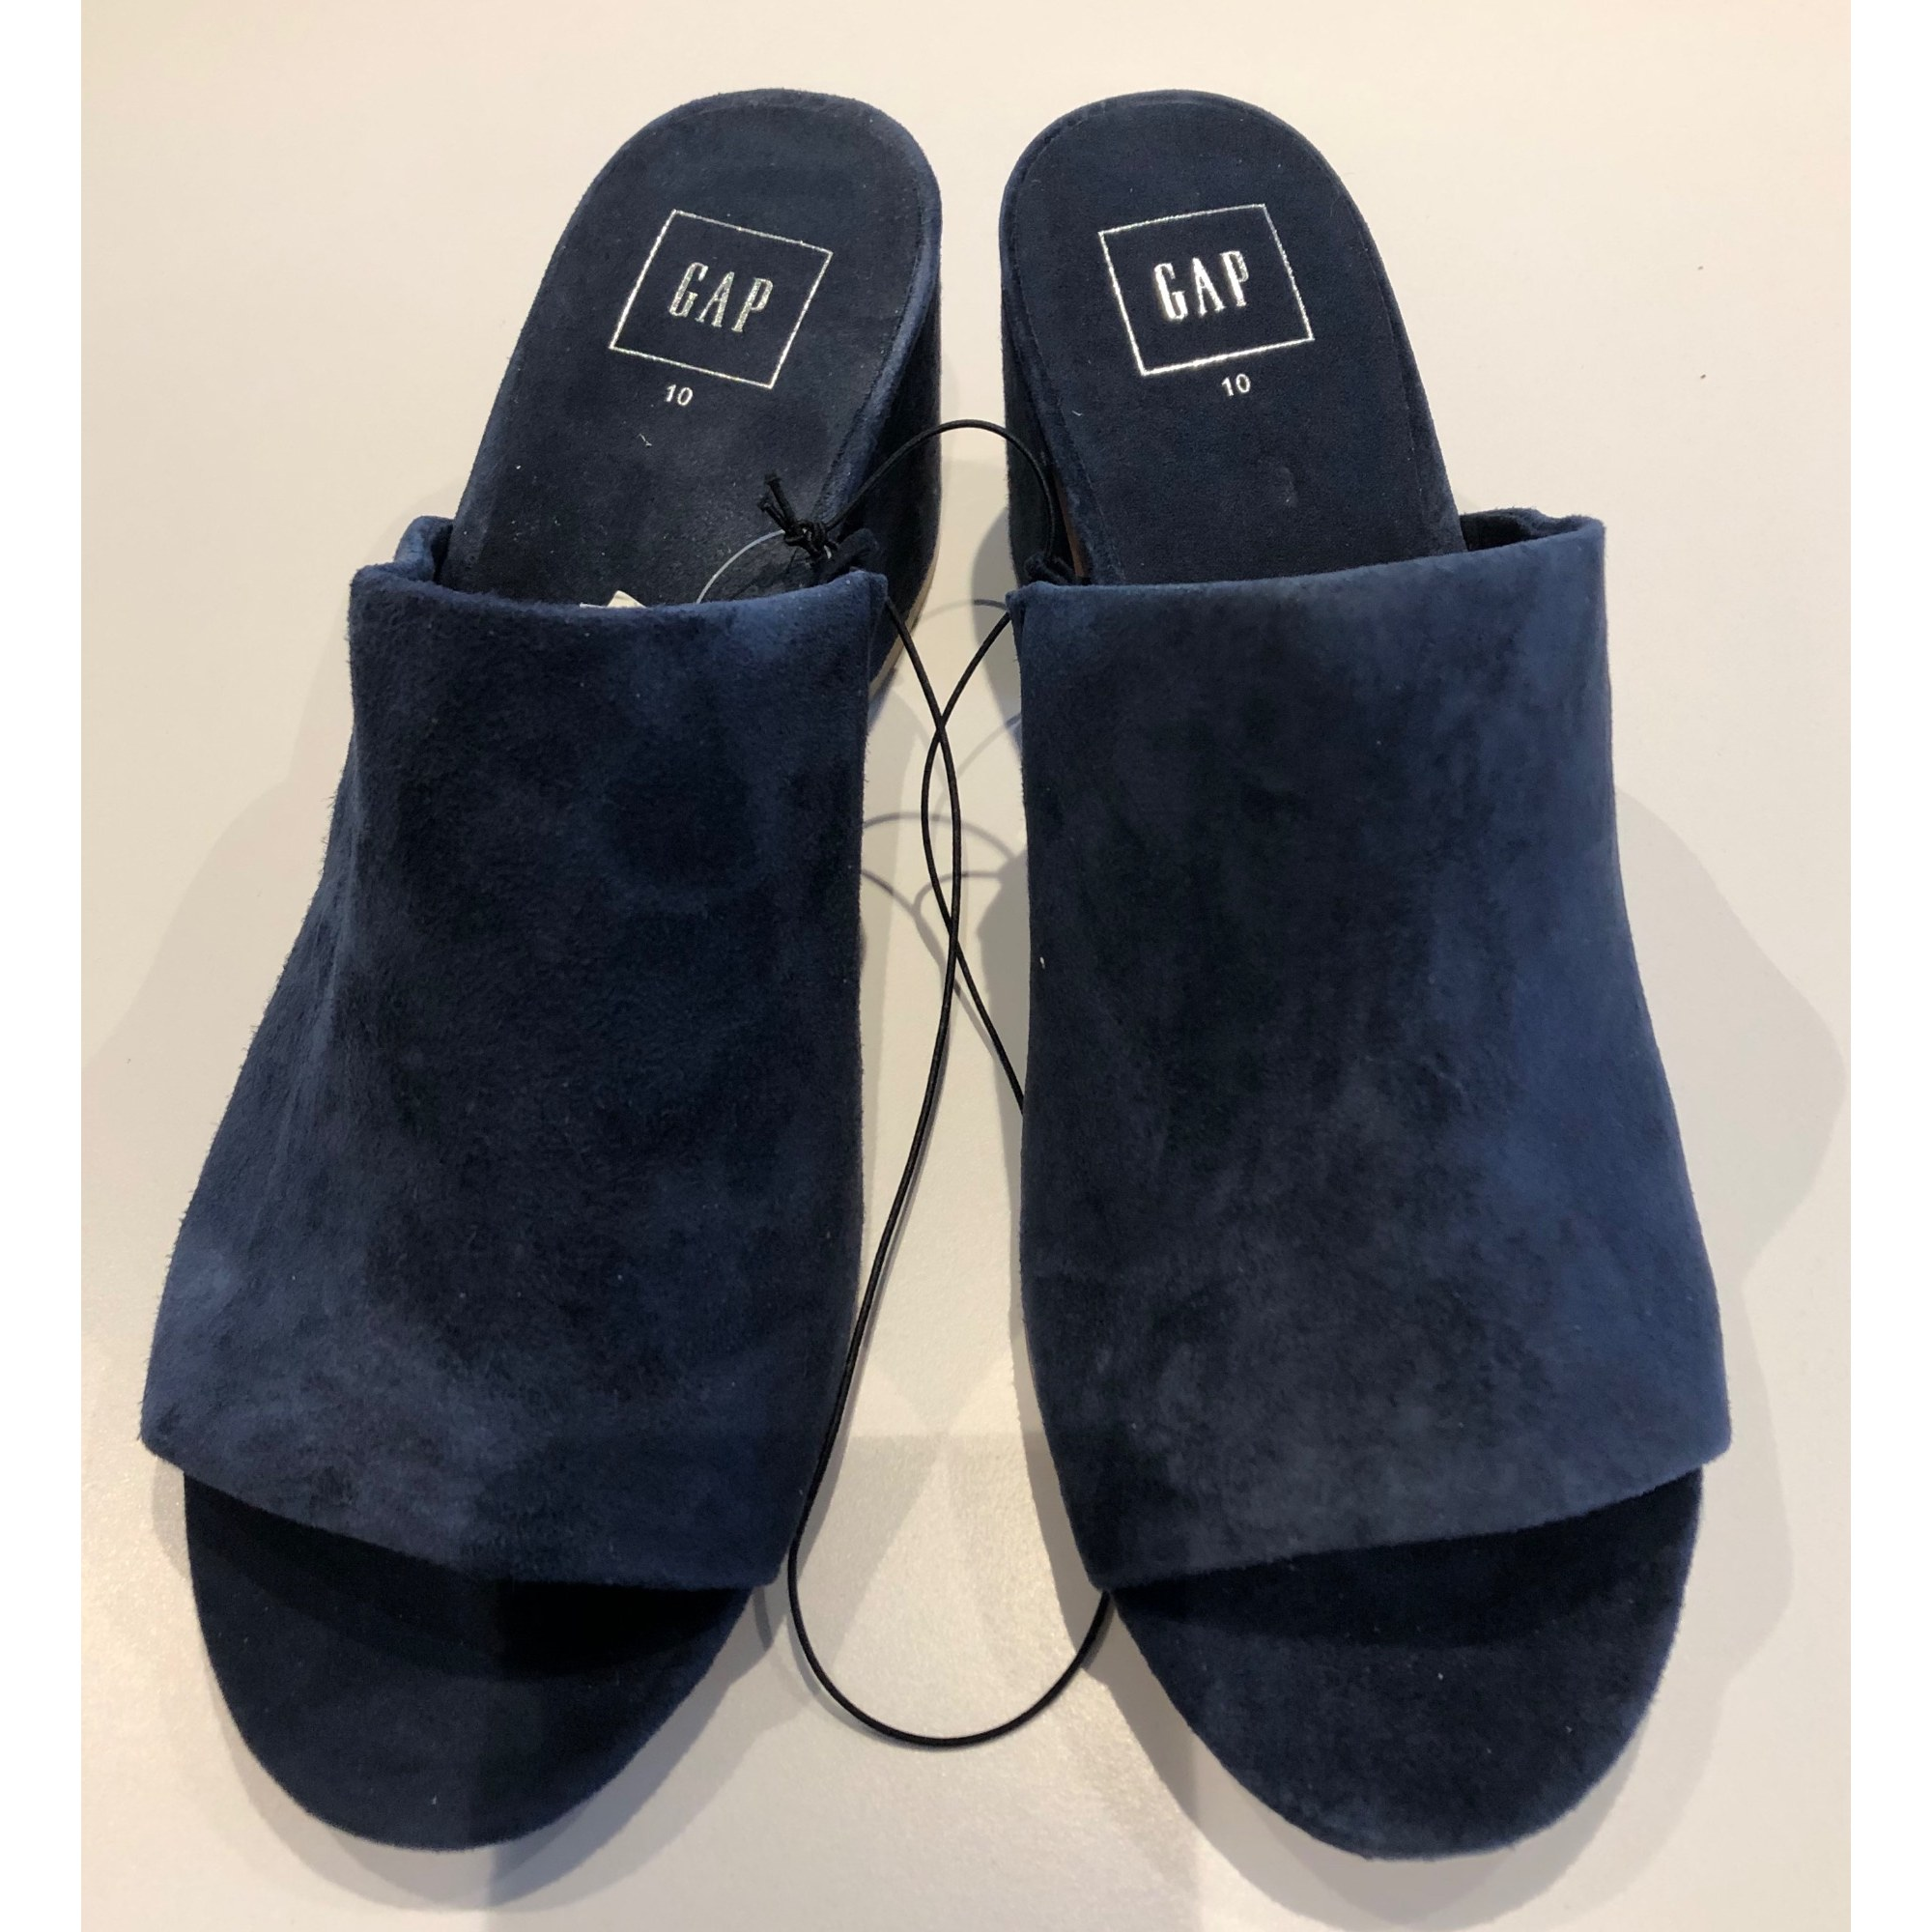 Mules GAP Bleu, bleu marine, bleu turquoise